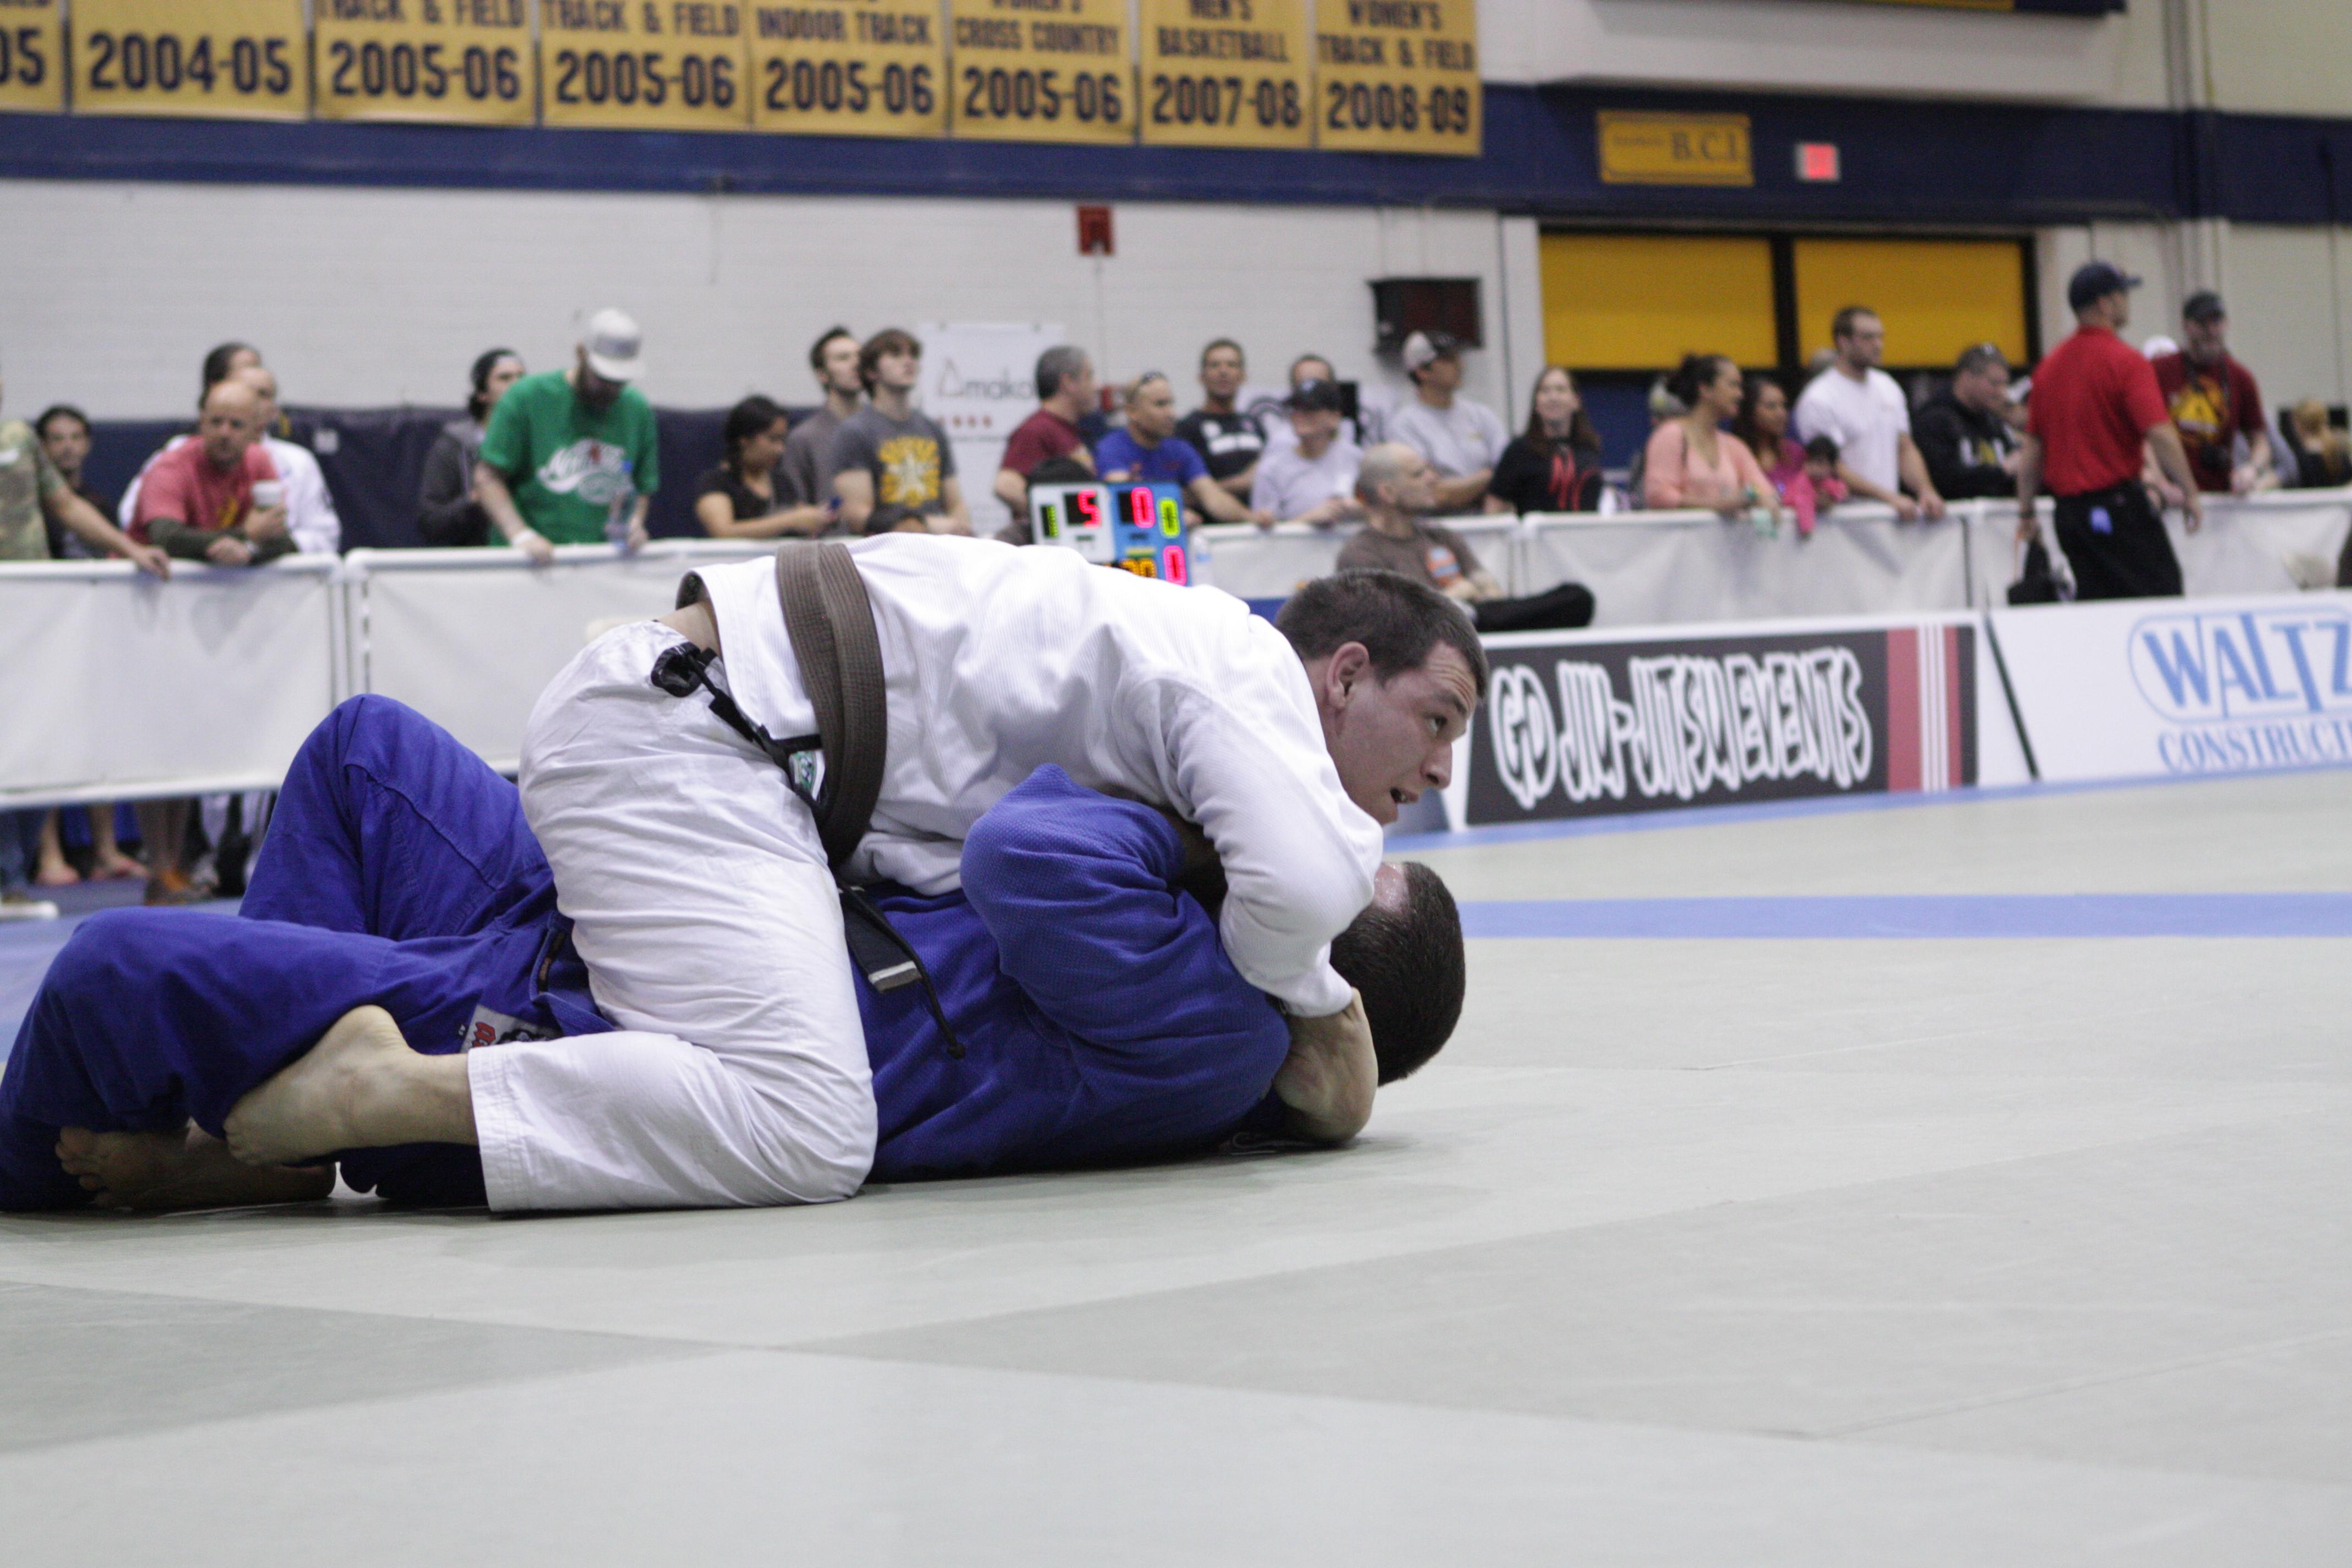 Daniel Hampton won double gold. Photo: Personal Archive